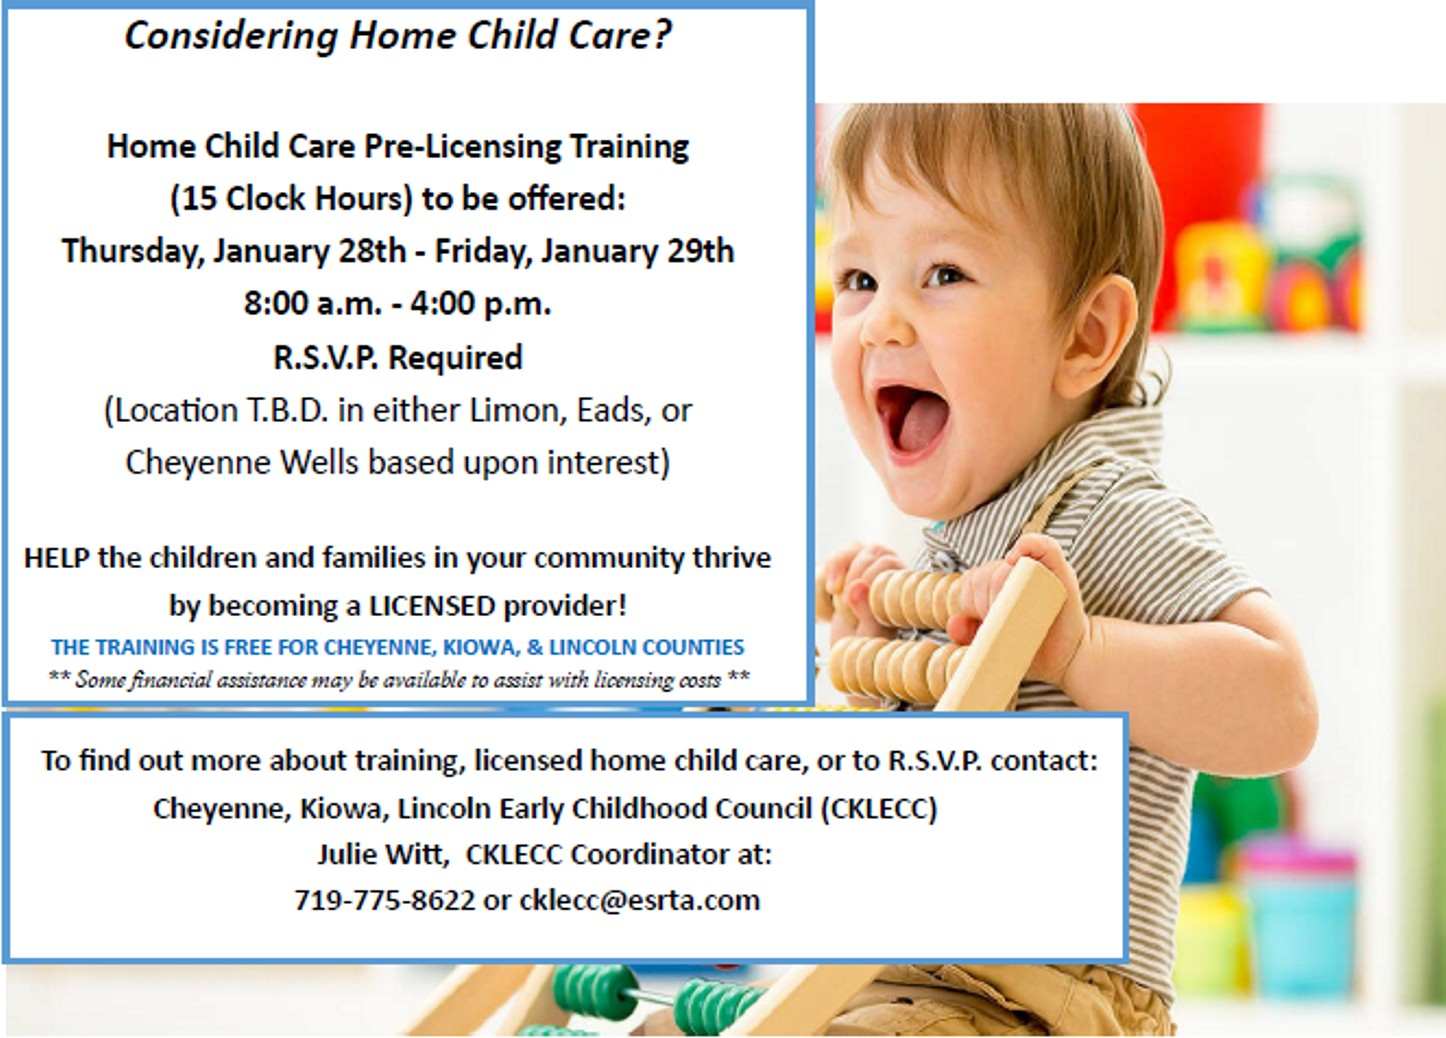 AD 2021-01 Education - Licensed Home Child Care - CKLECC